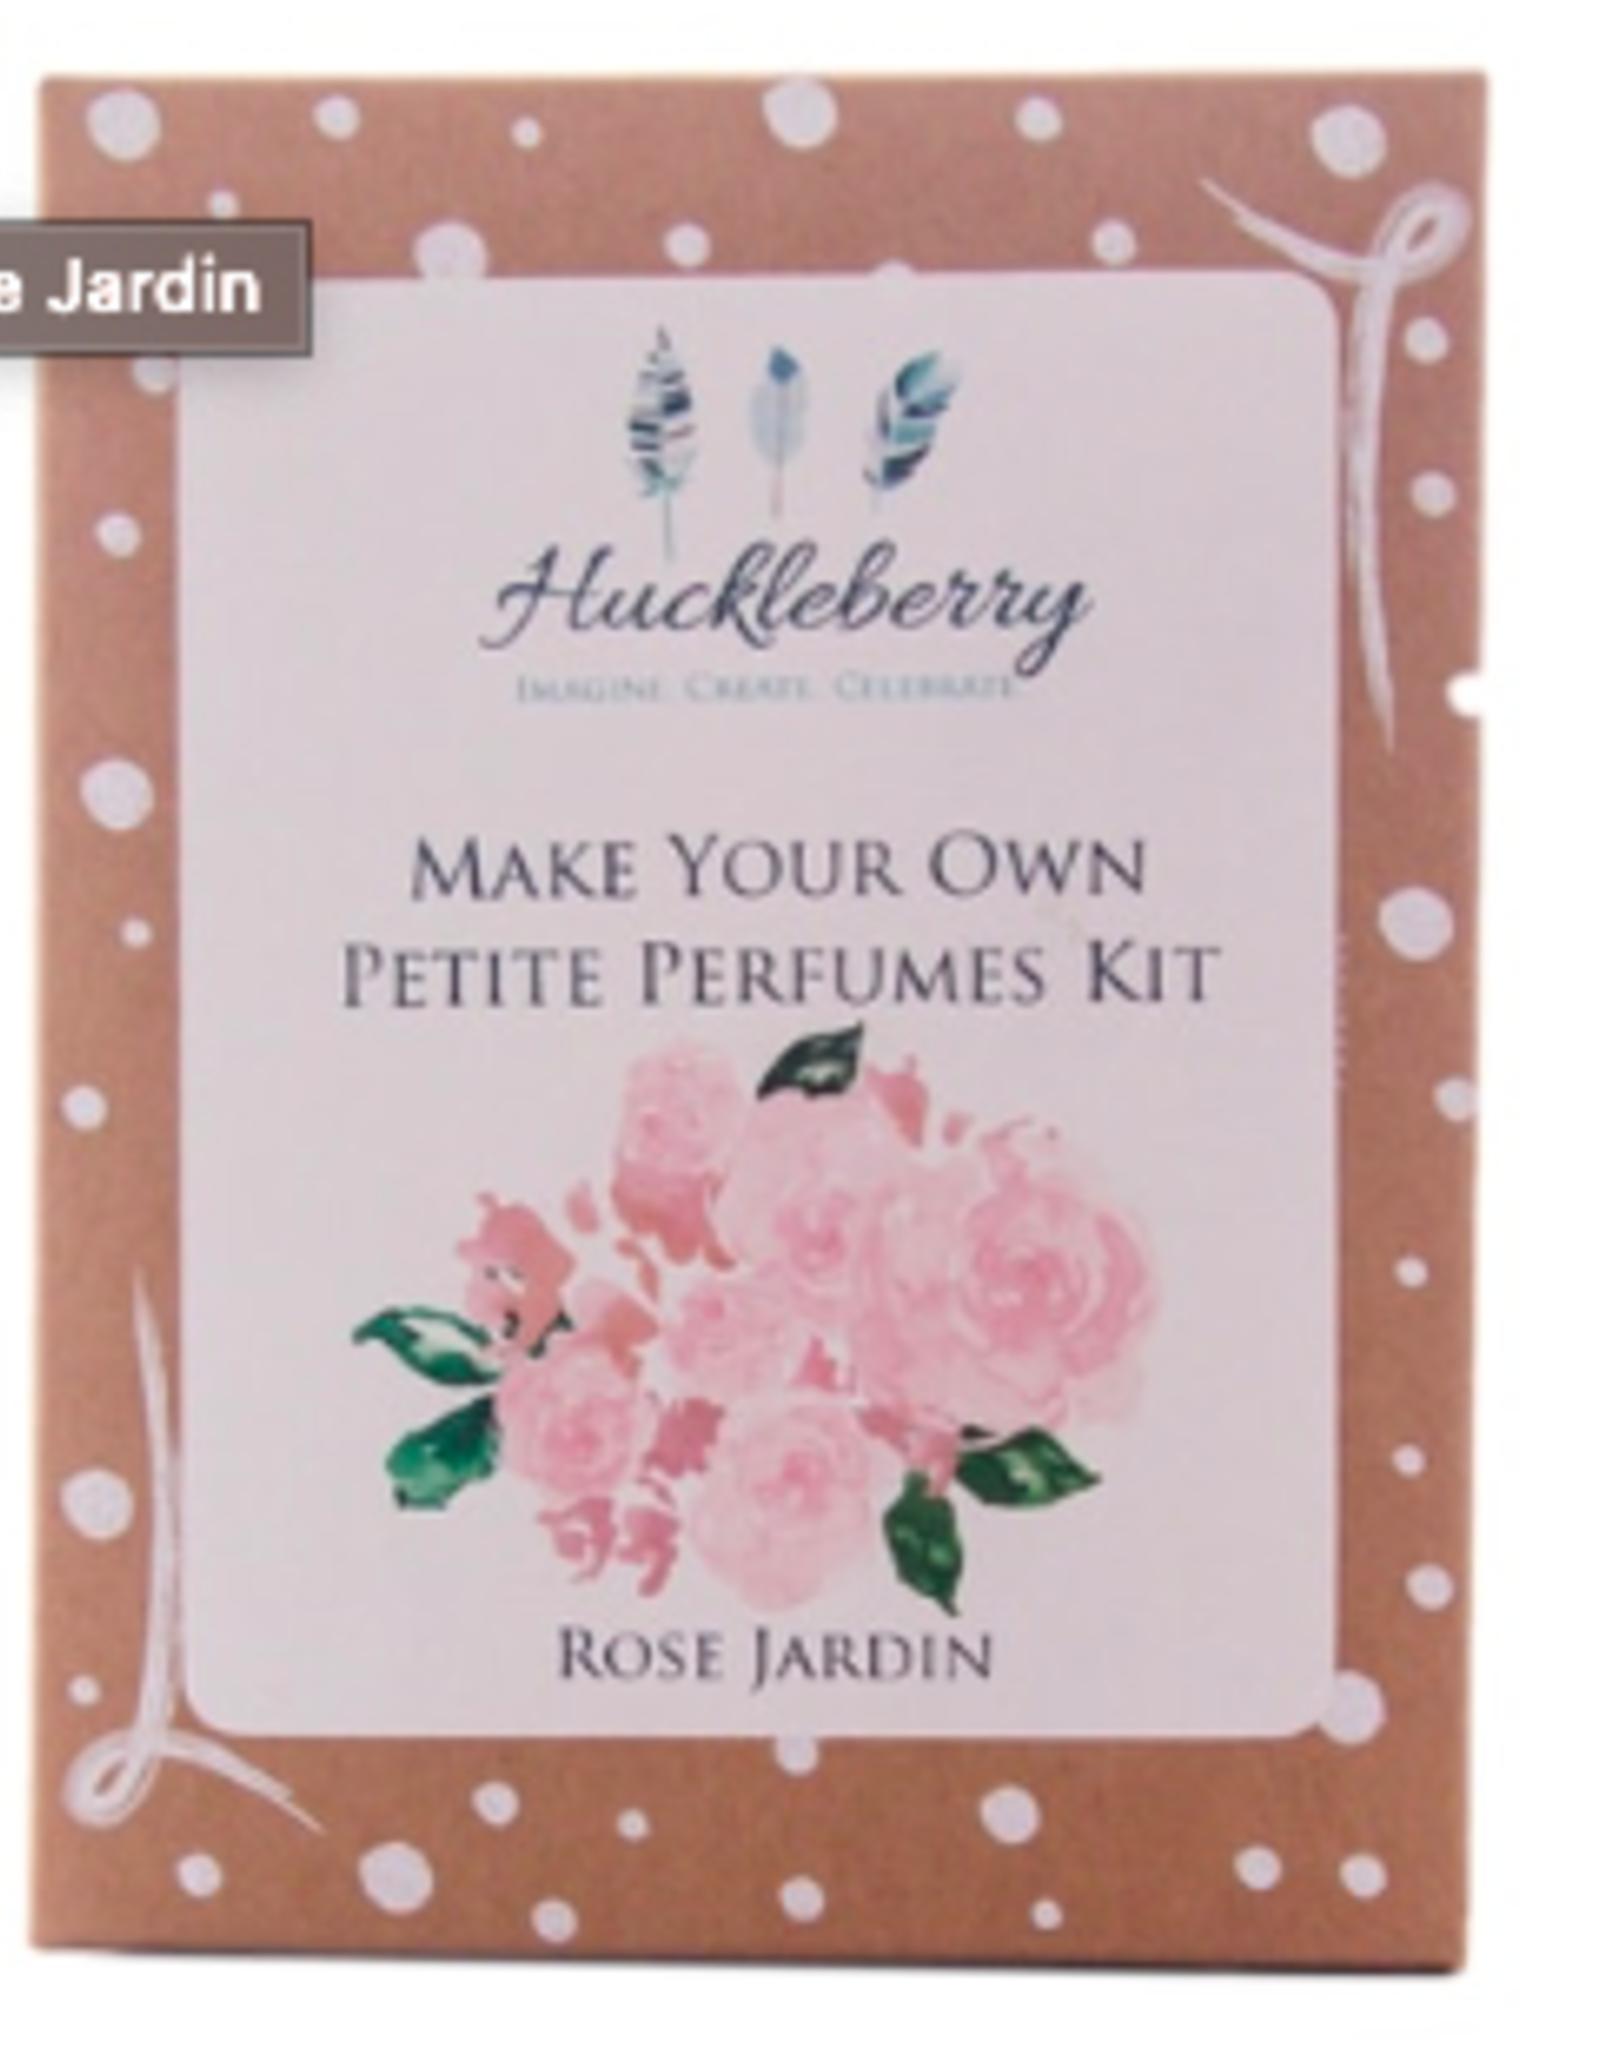 Huckleberry Huckleberry - Petit Perfume Rose Jardin